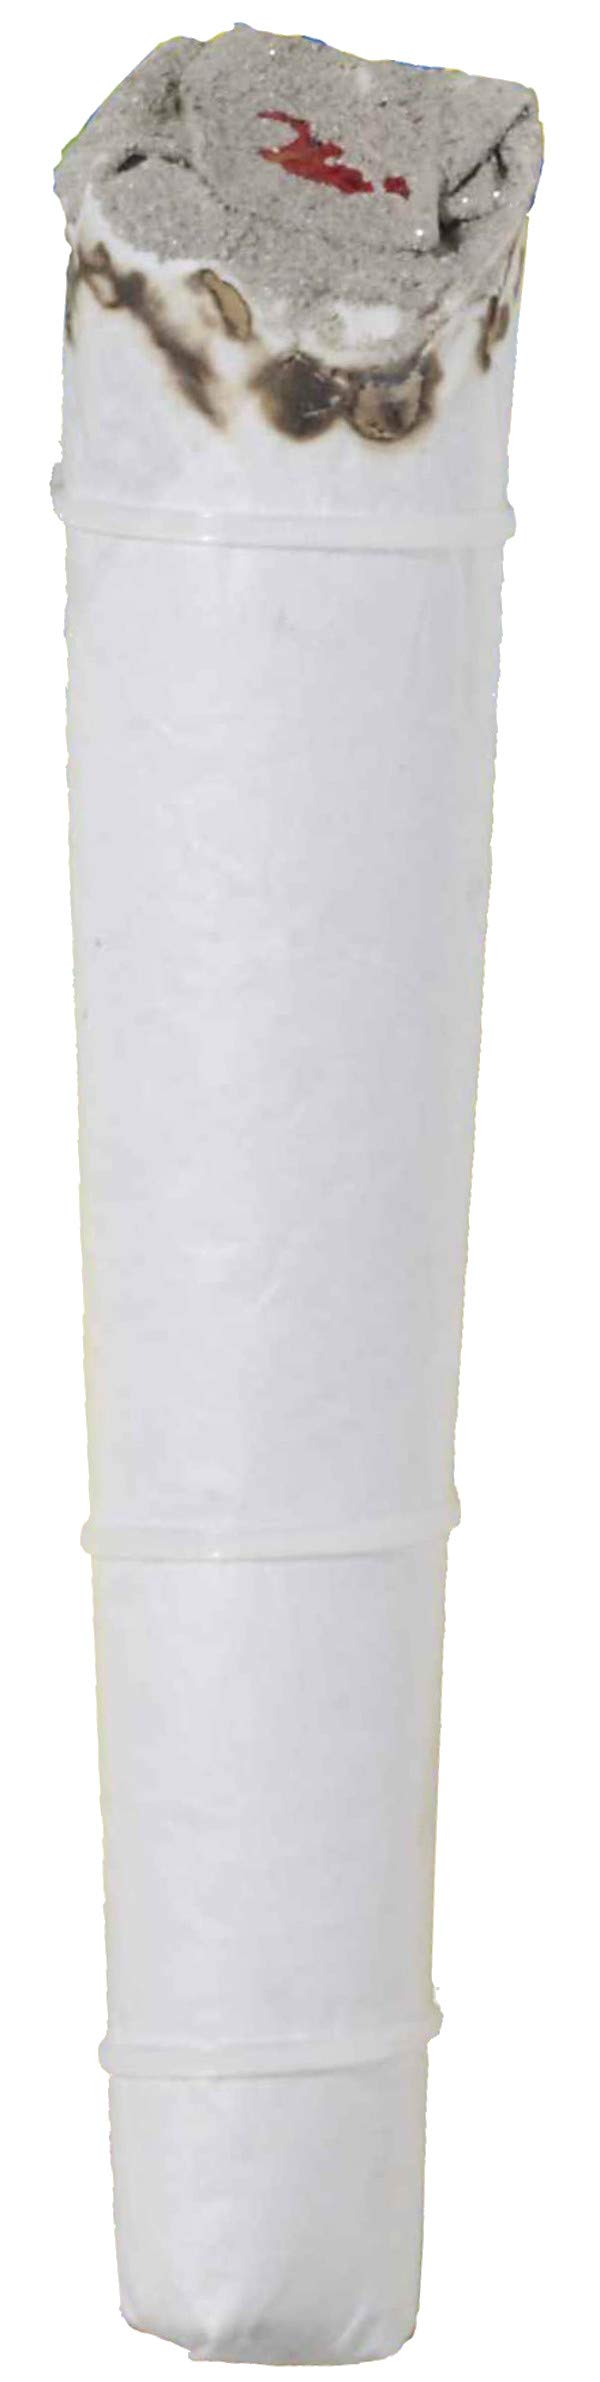 Forum Novelties The Big Smoke - Polyester, White, Standard Size